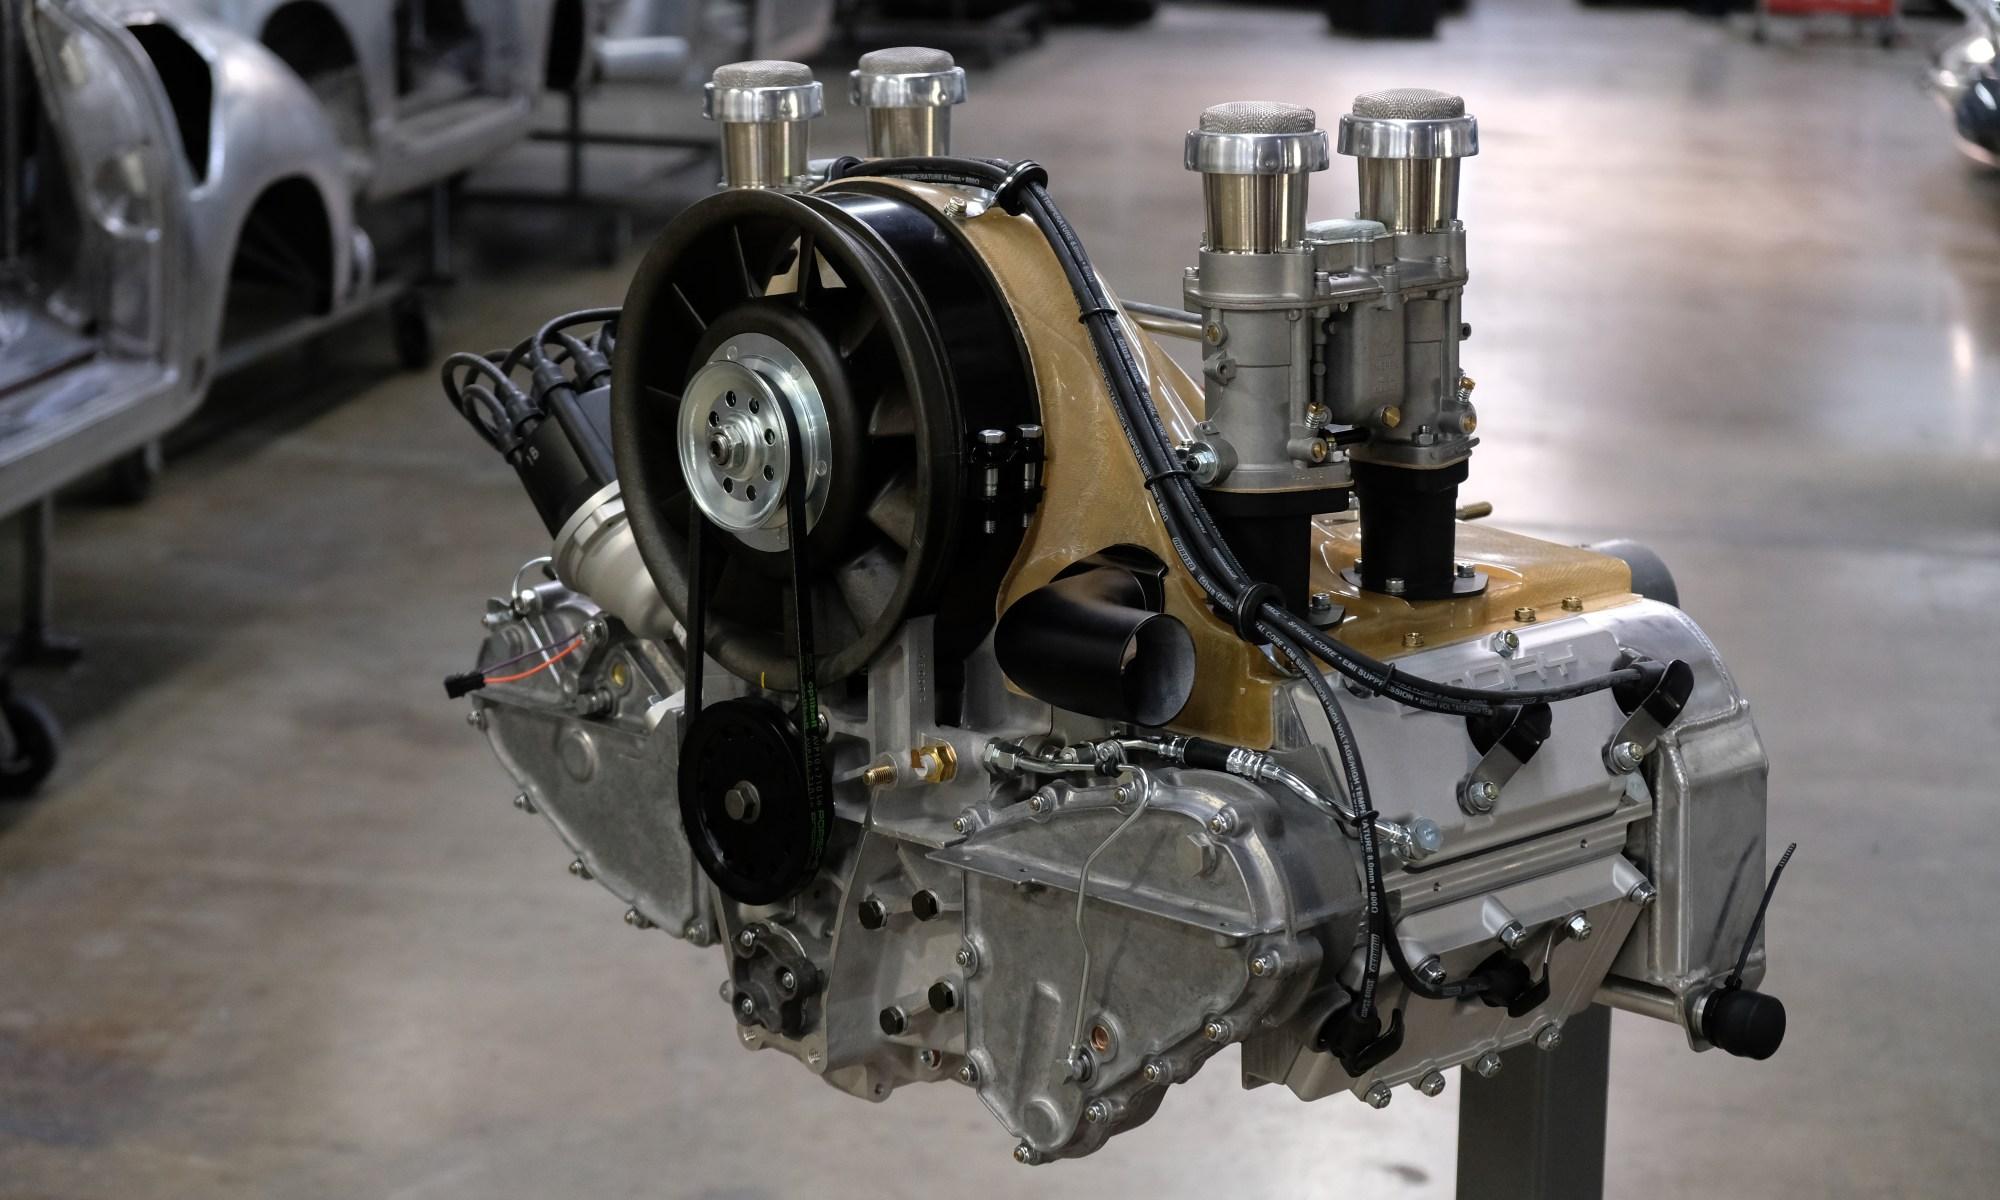 Outlaw-4 Engine | Emory Motorsports